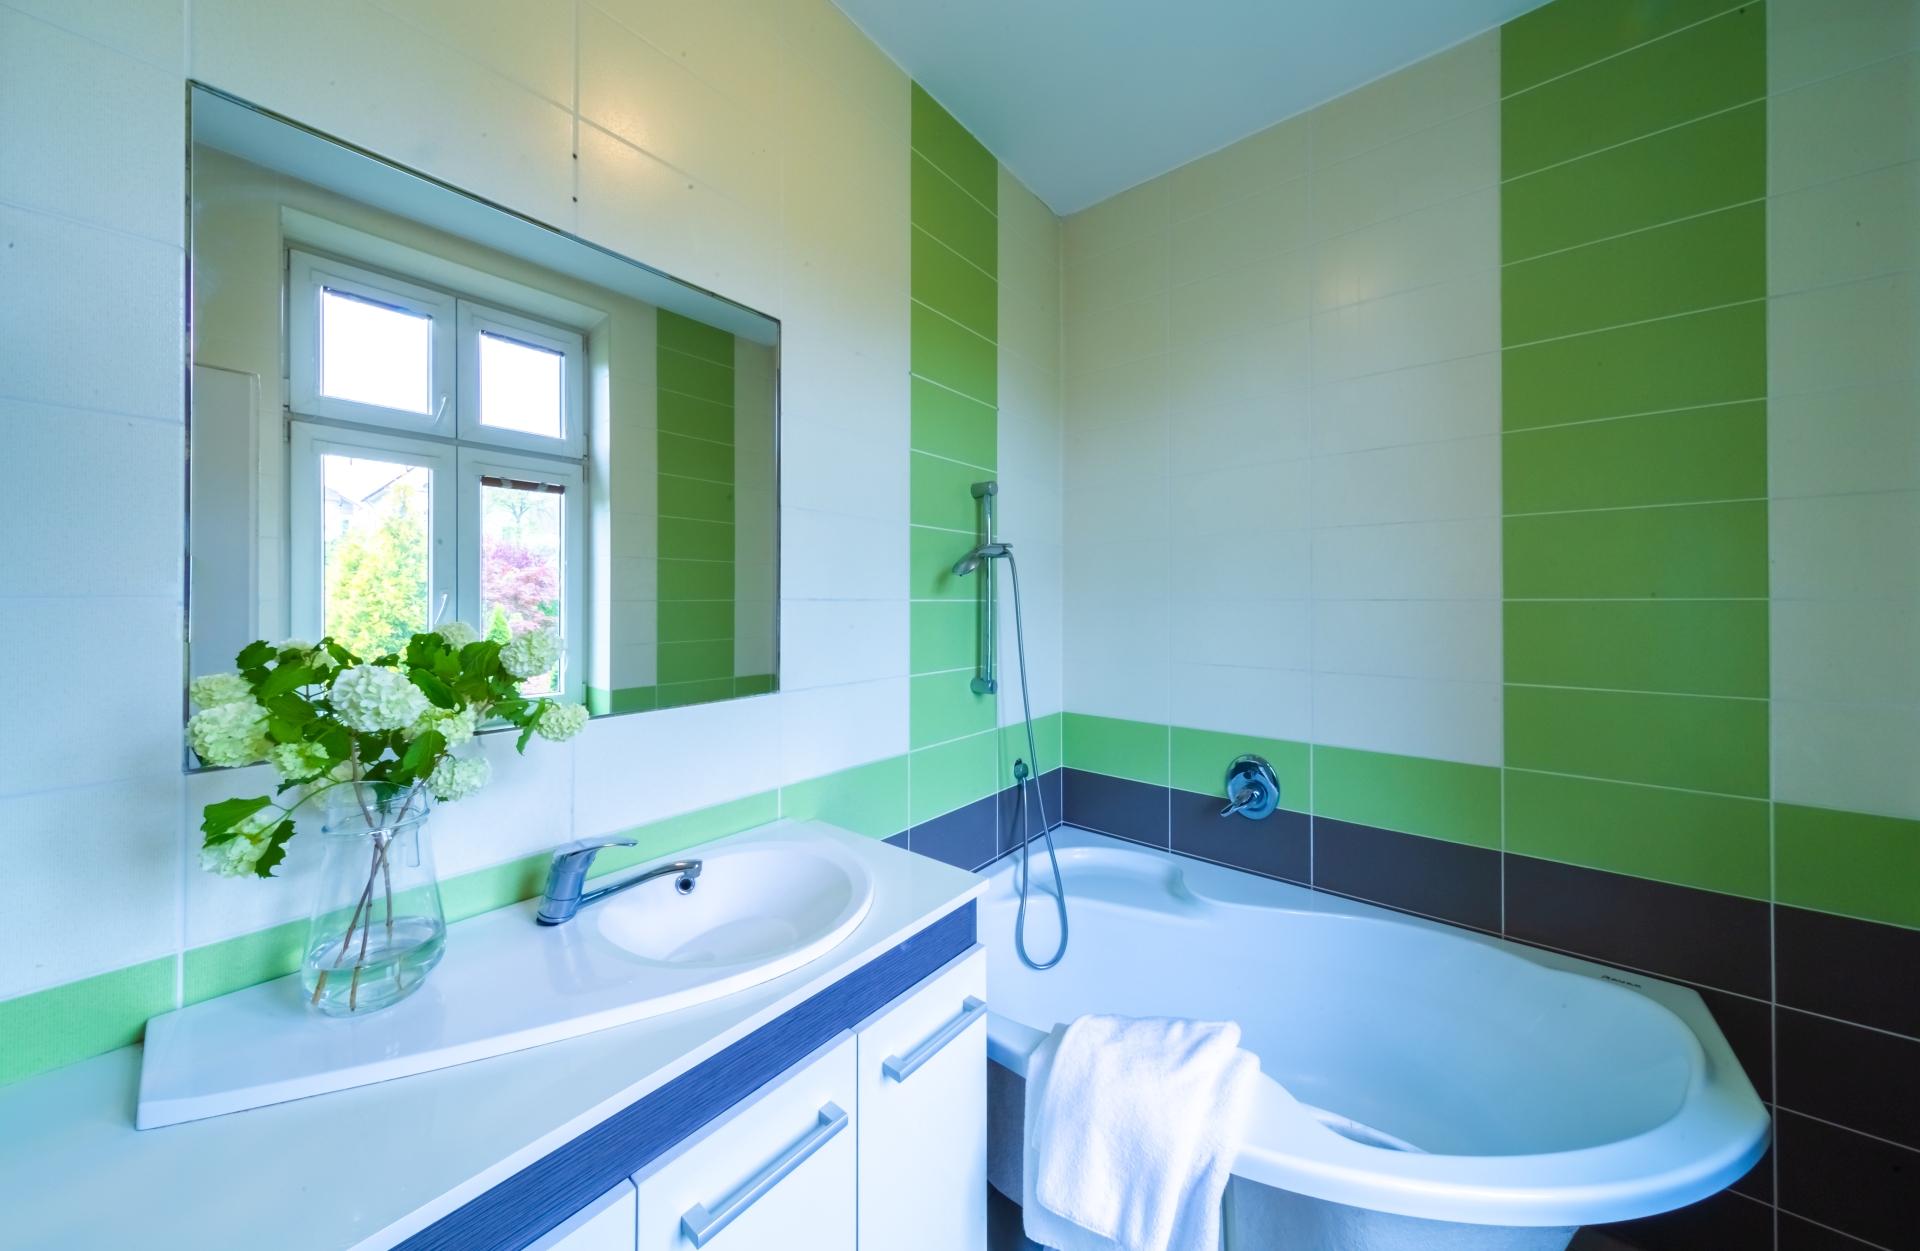 koupelna kvetina vana umyvadlo zrcadlo rucnik